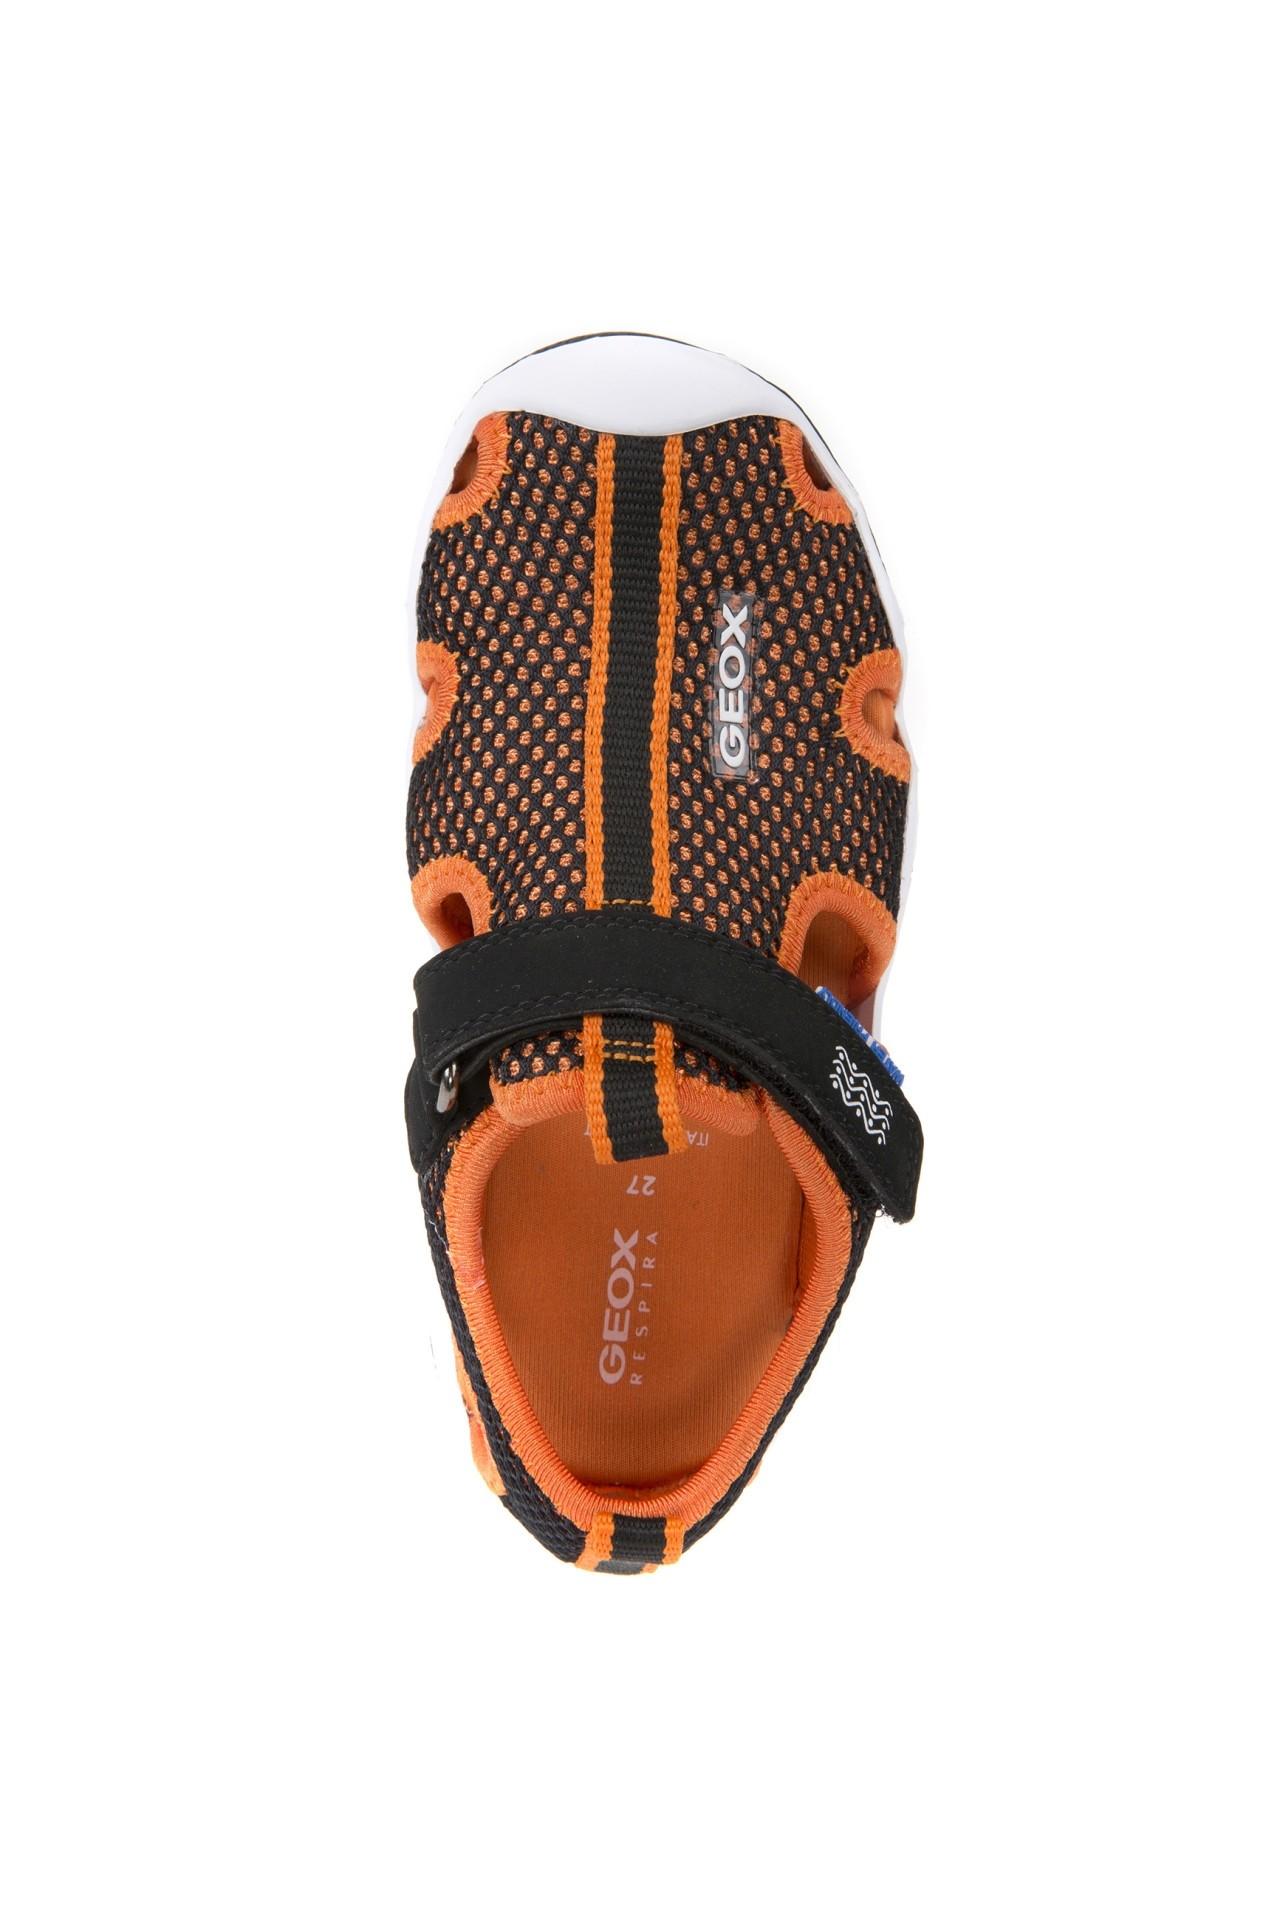 Geox Wader Black Orange Sandals Little Wanderers